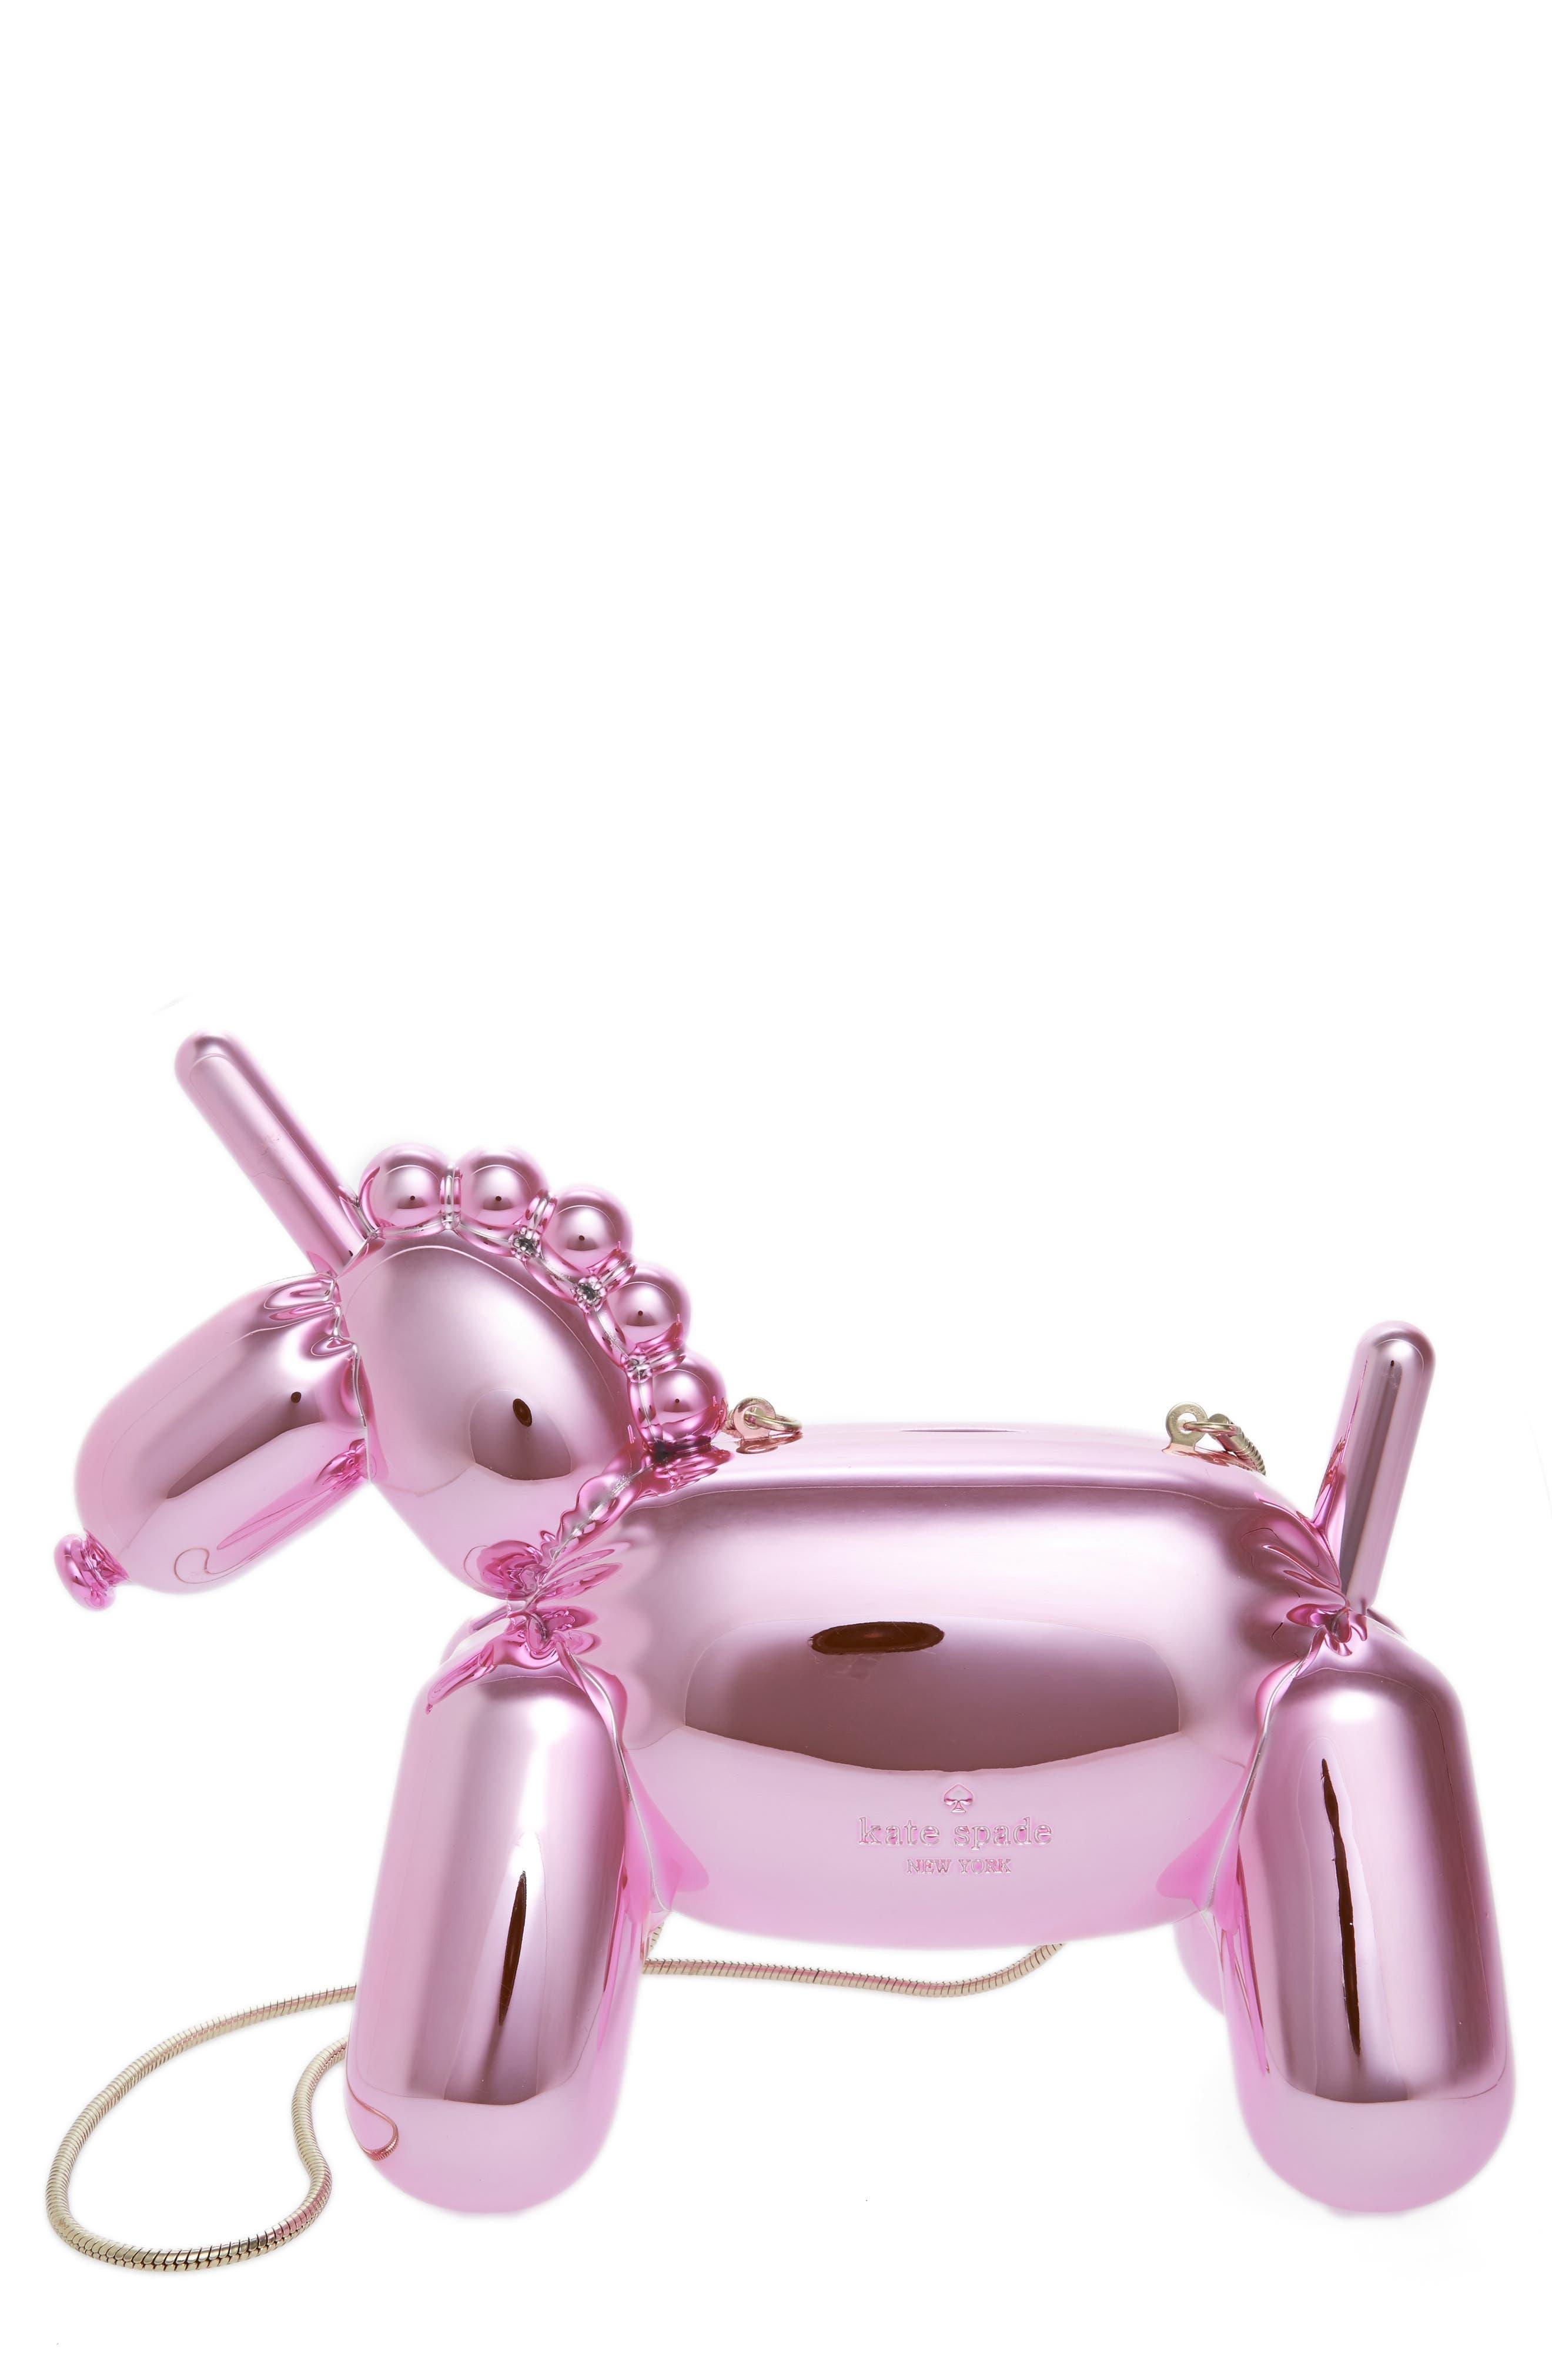 unicorn balloon clutch, Main, color, 104